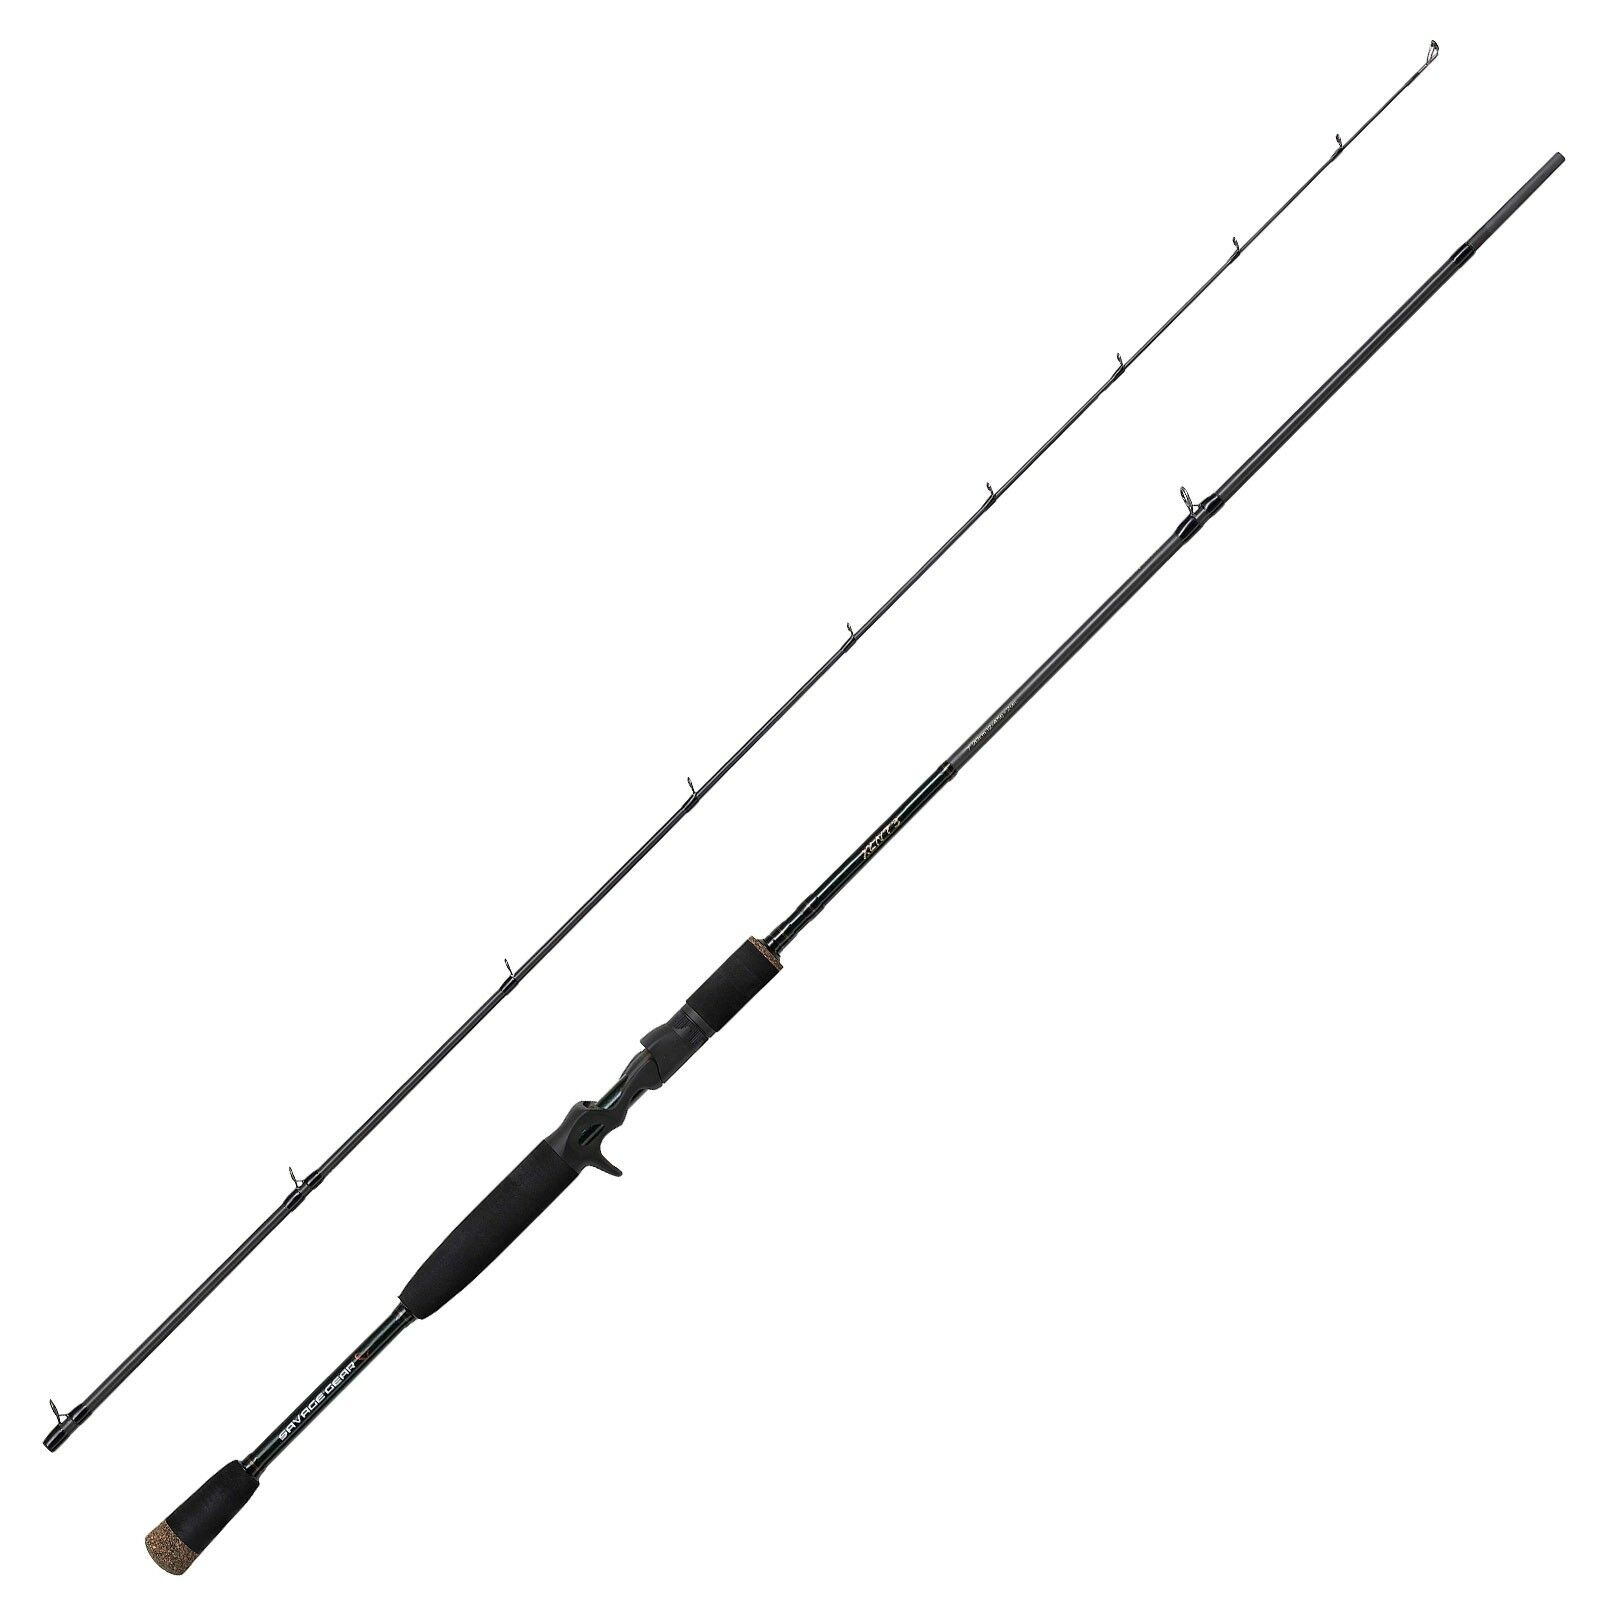 Savage Gear baitcastrute – XLNT trigger 3 8ft3in 2,51m 100g 2 pezzi